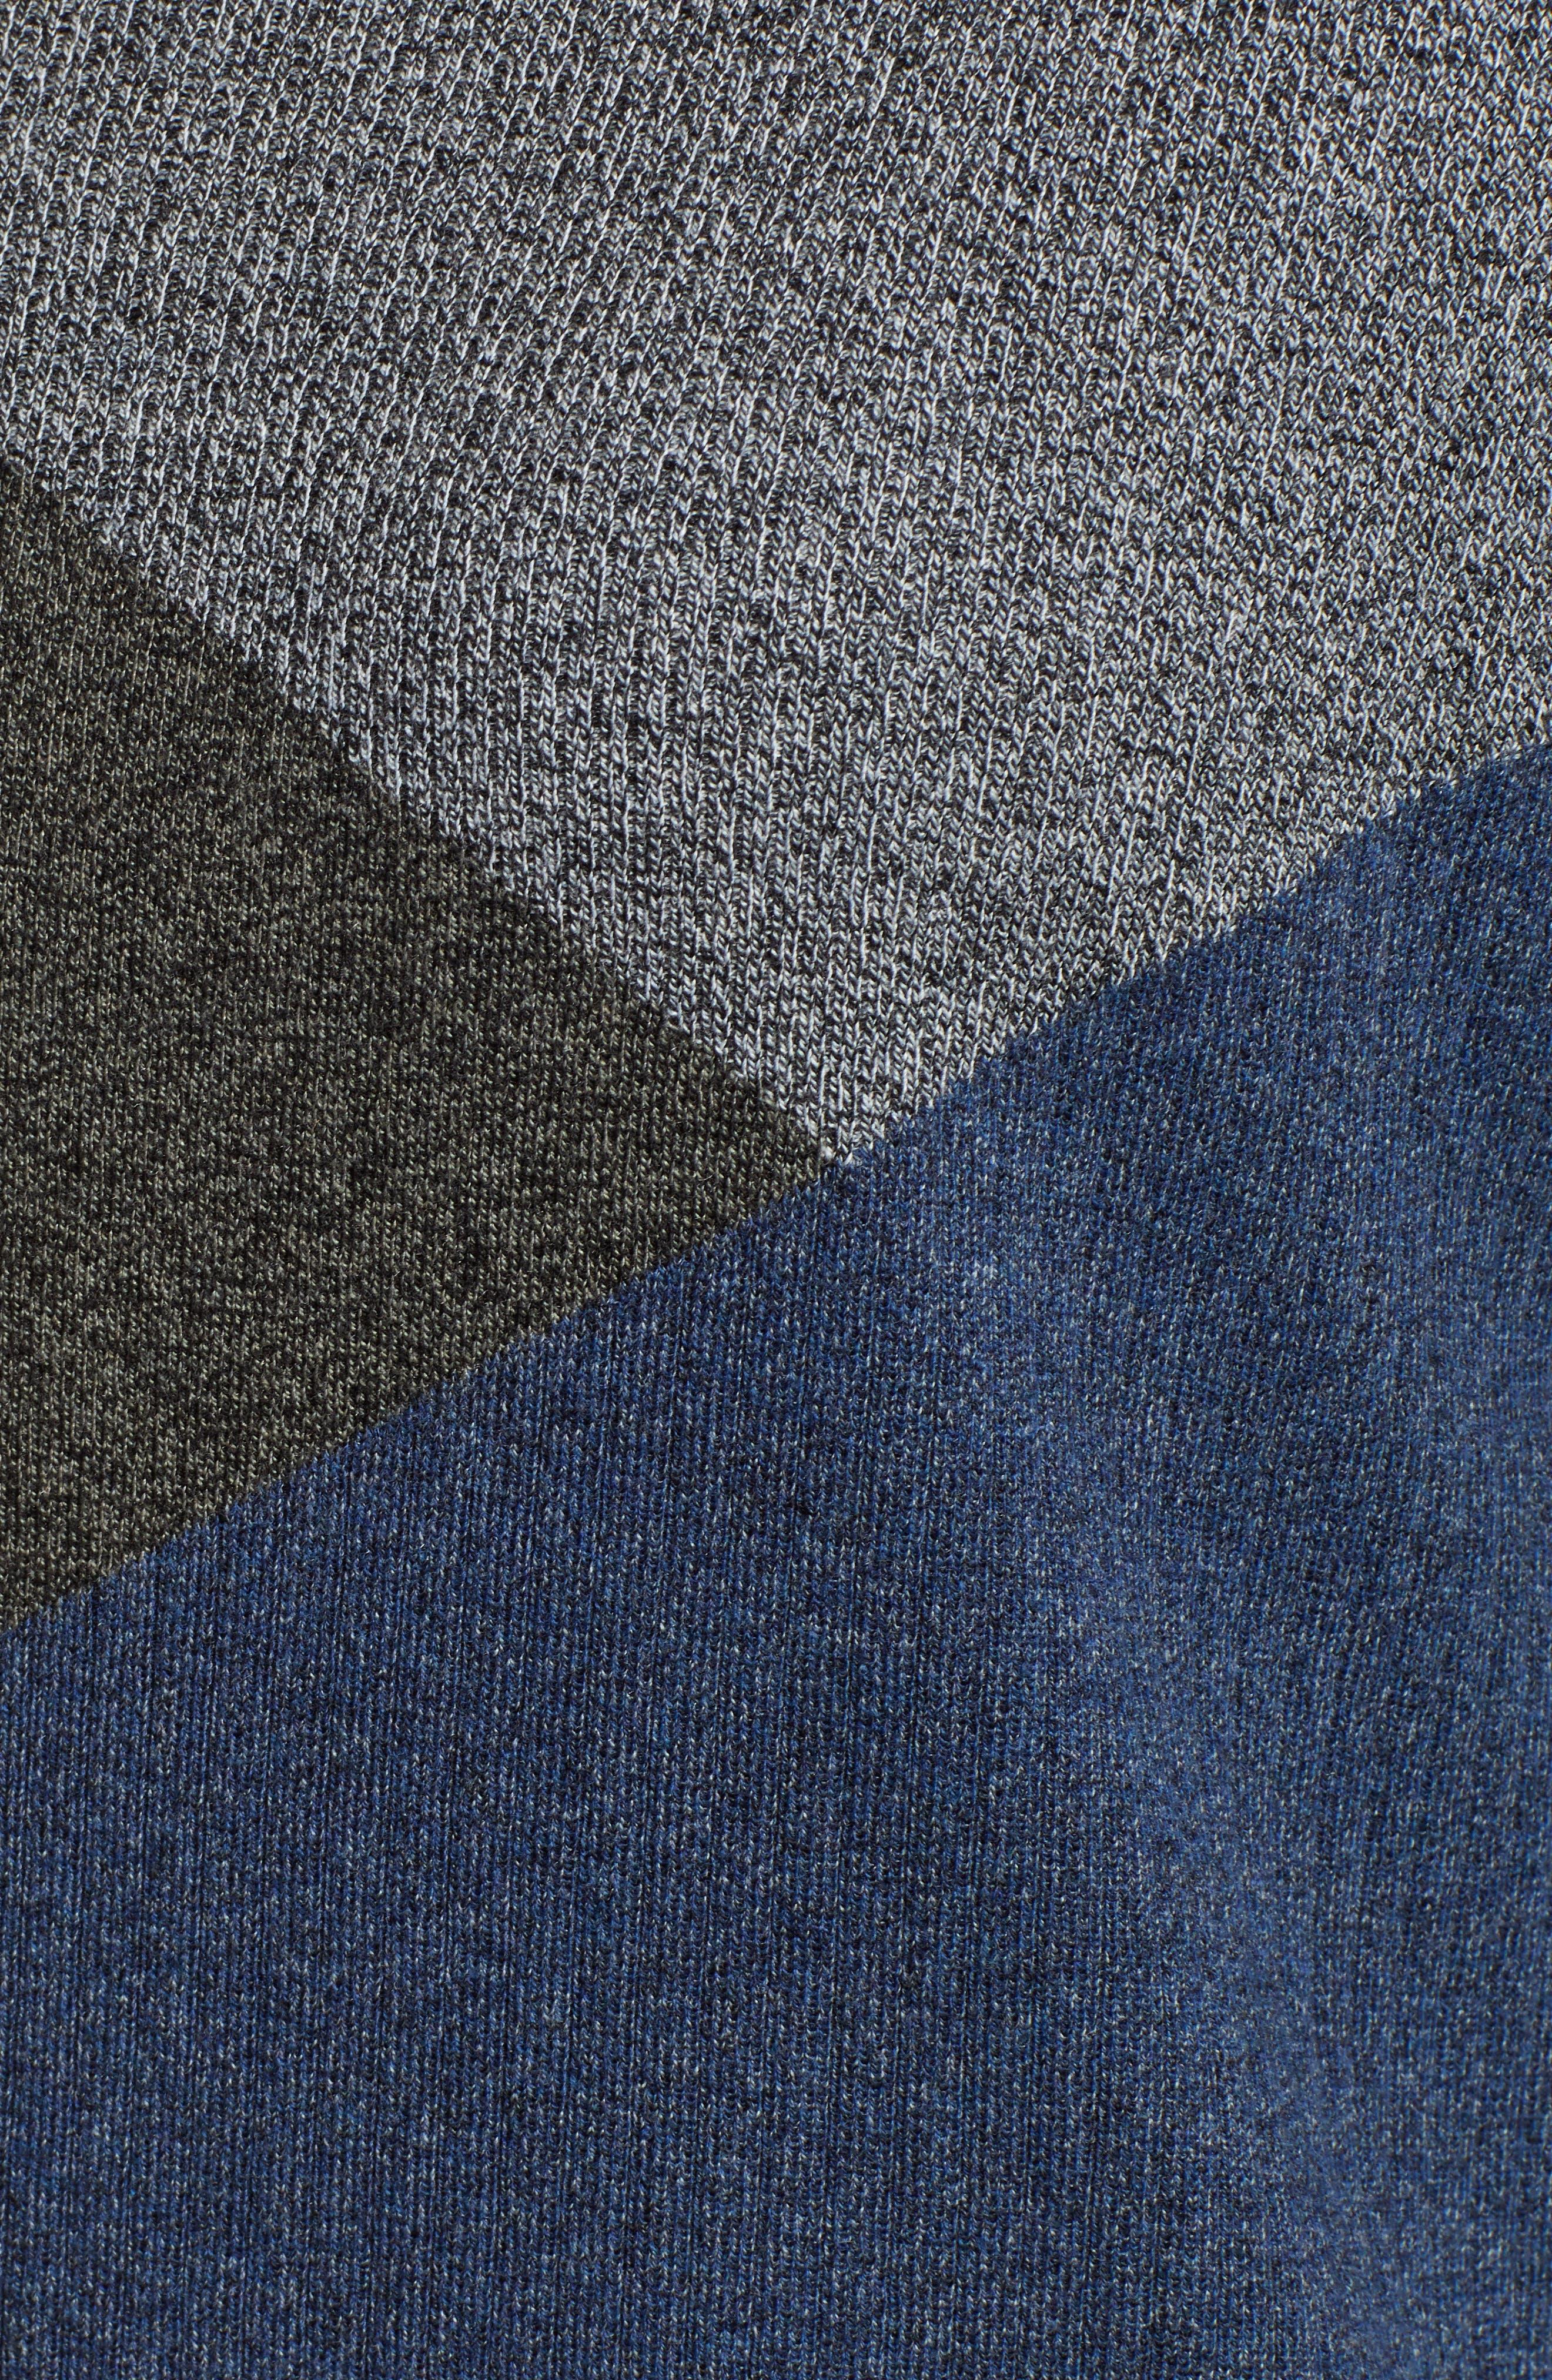 Laid Back Sweater Dress,                             Alternate thumbnail 6, color,                             090